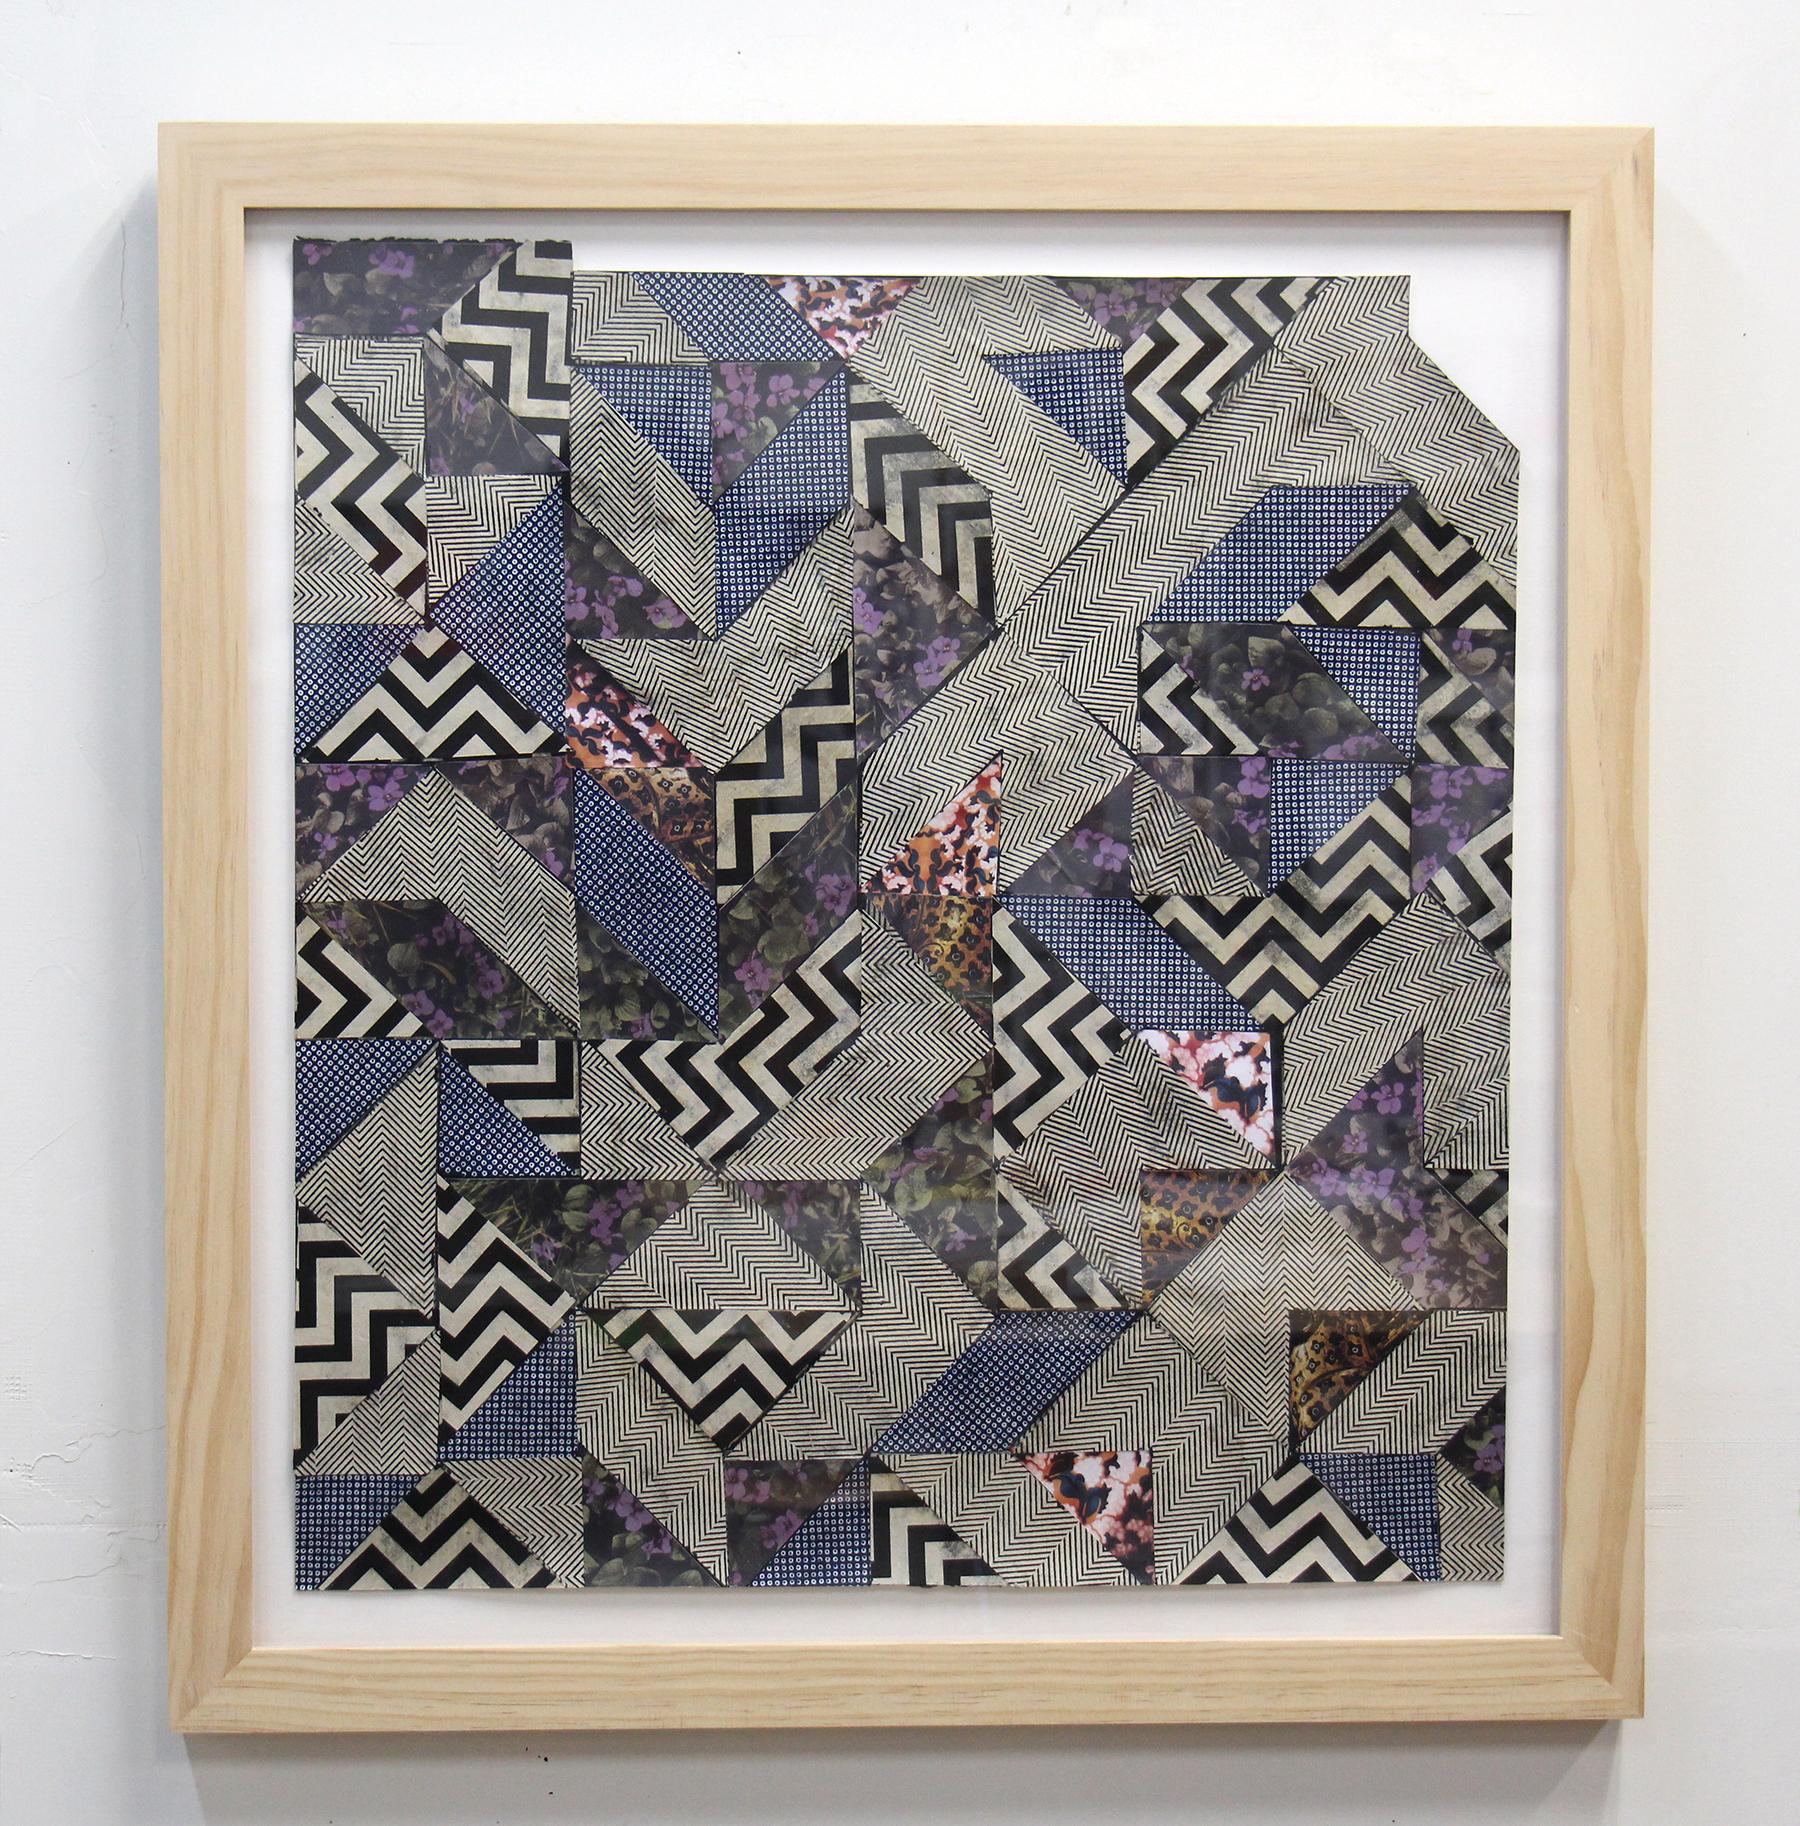 Untitled(Garden&Tile)2015